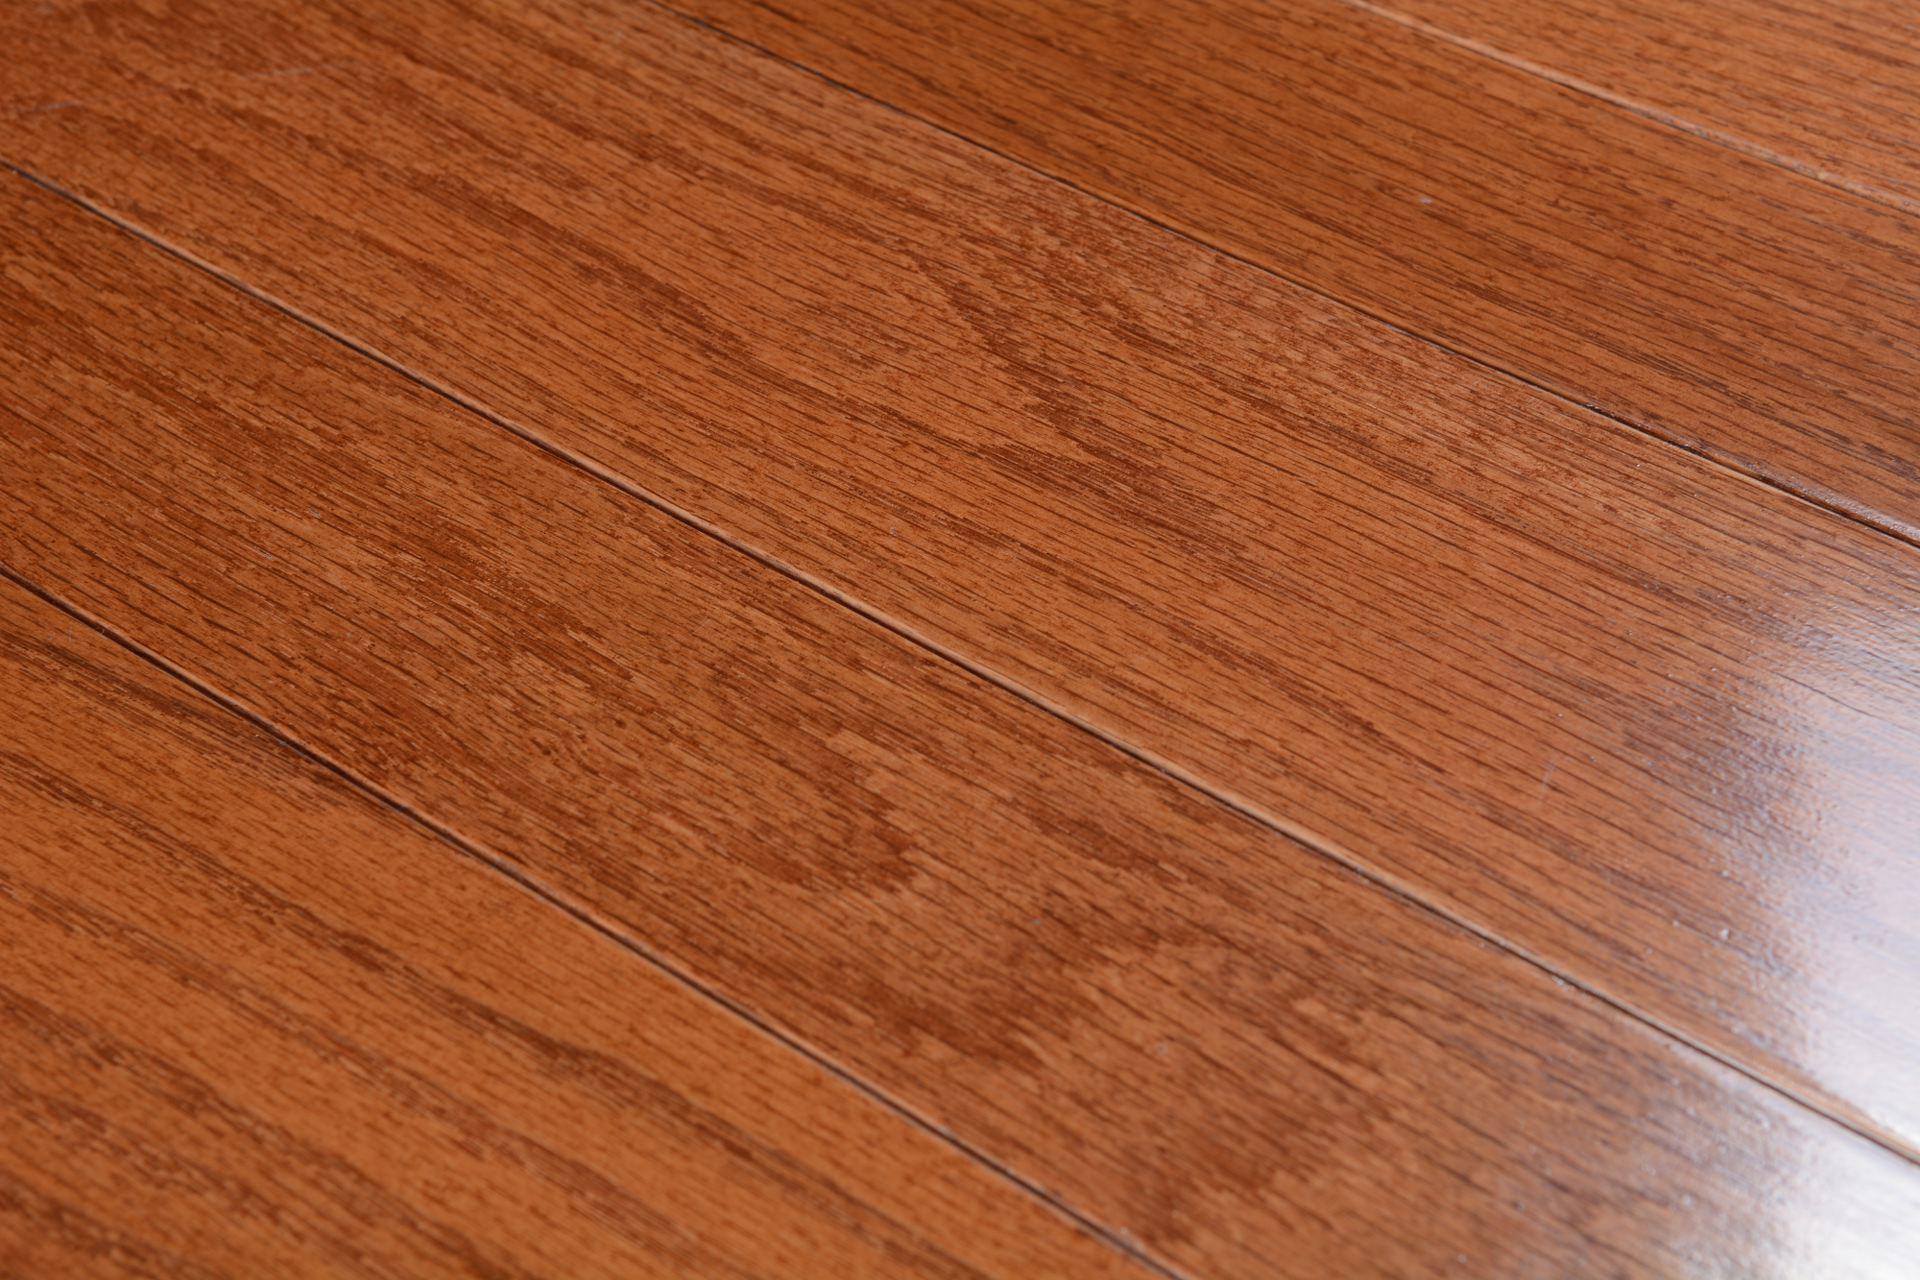 Somerset Solid Smooth High Gloss Collection Gunstock Bog 6154 Direct Hardwood Flooring Charlotte